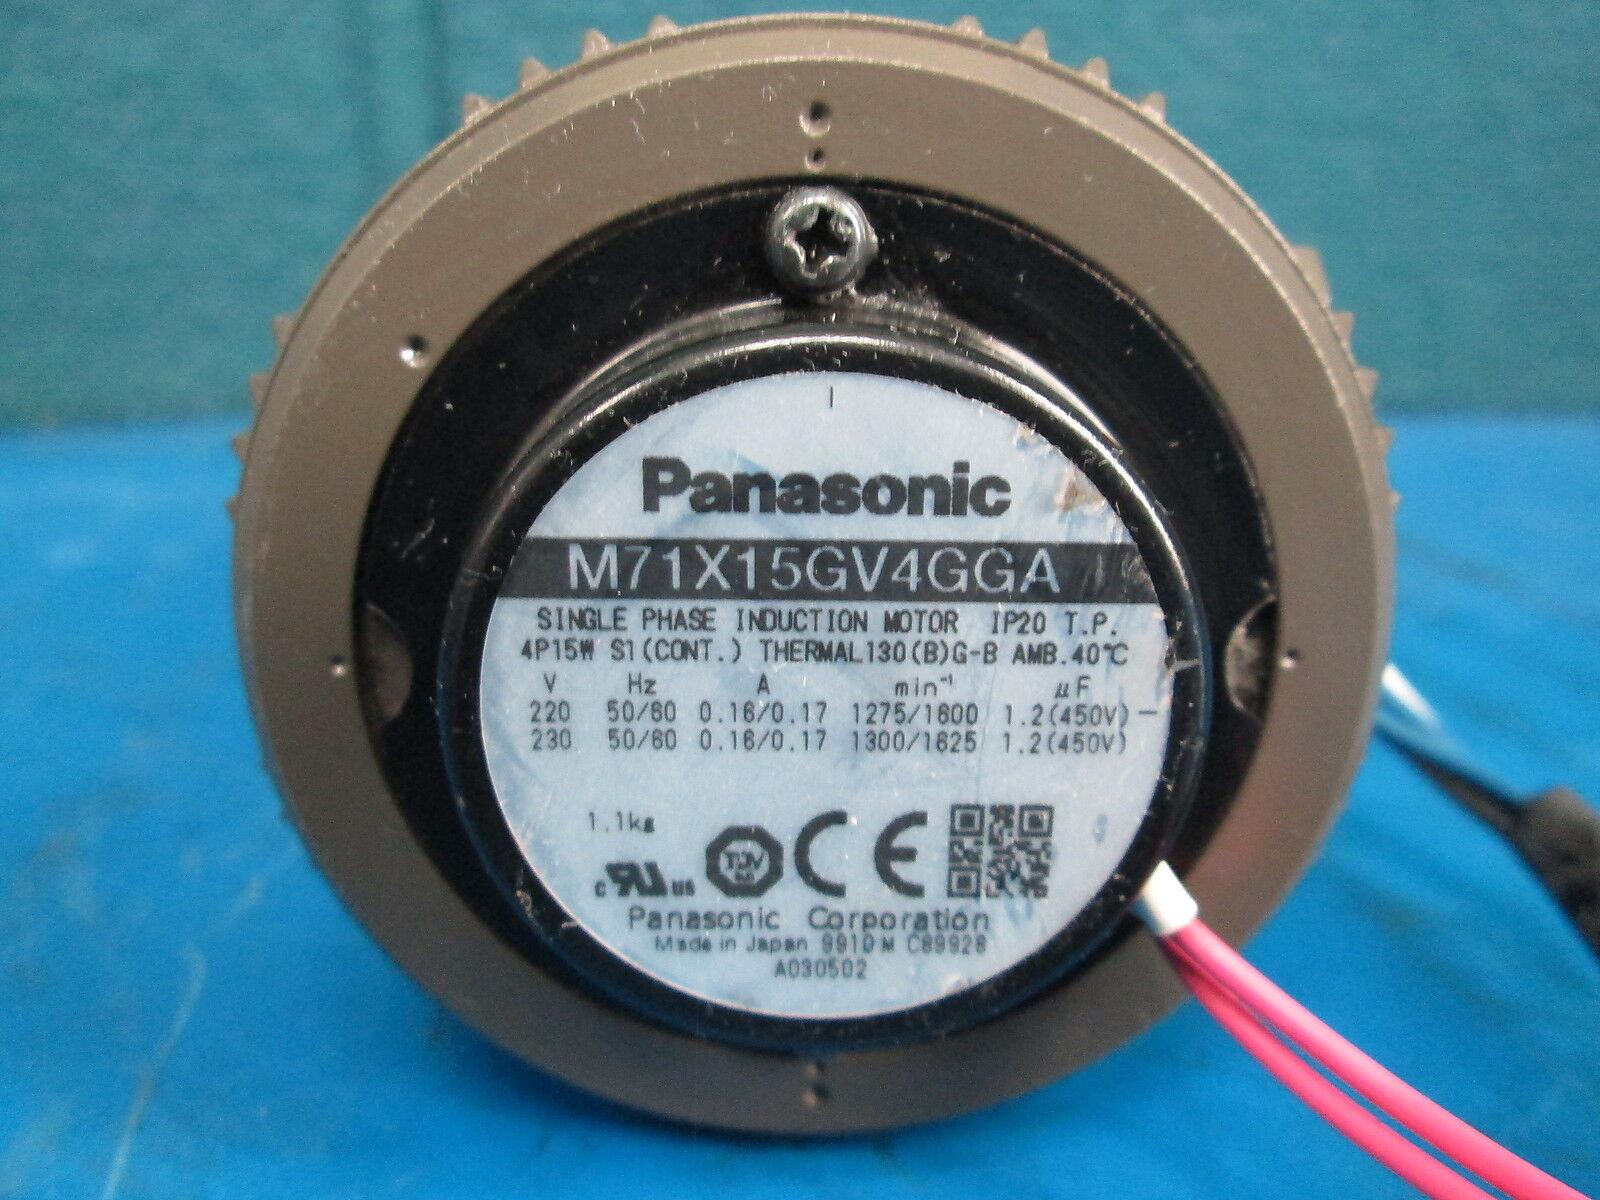 Panasonic MX7G15MA Single Phase Induction Motor M7RX15G4GGA 9Z14 | eBay